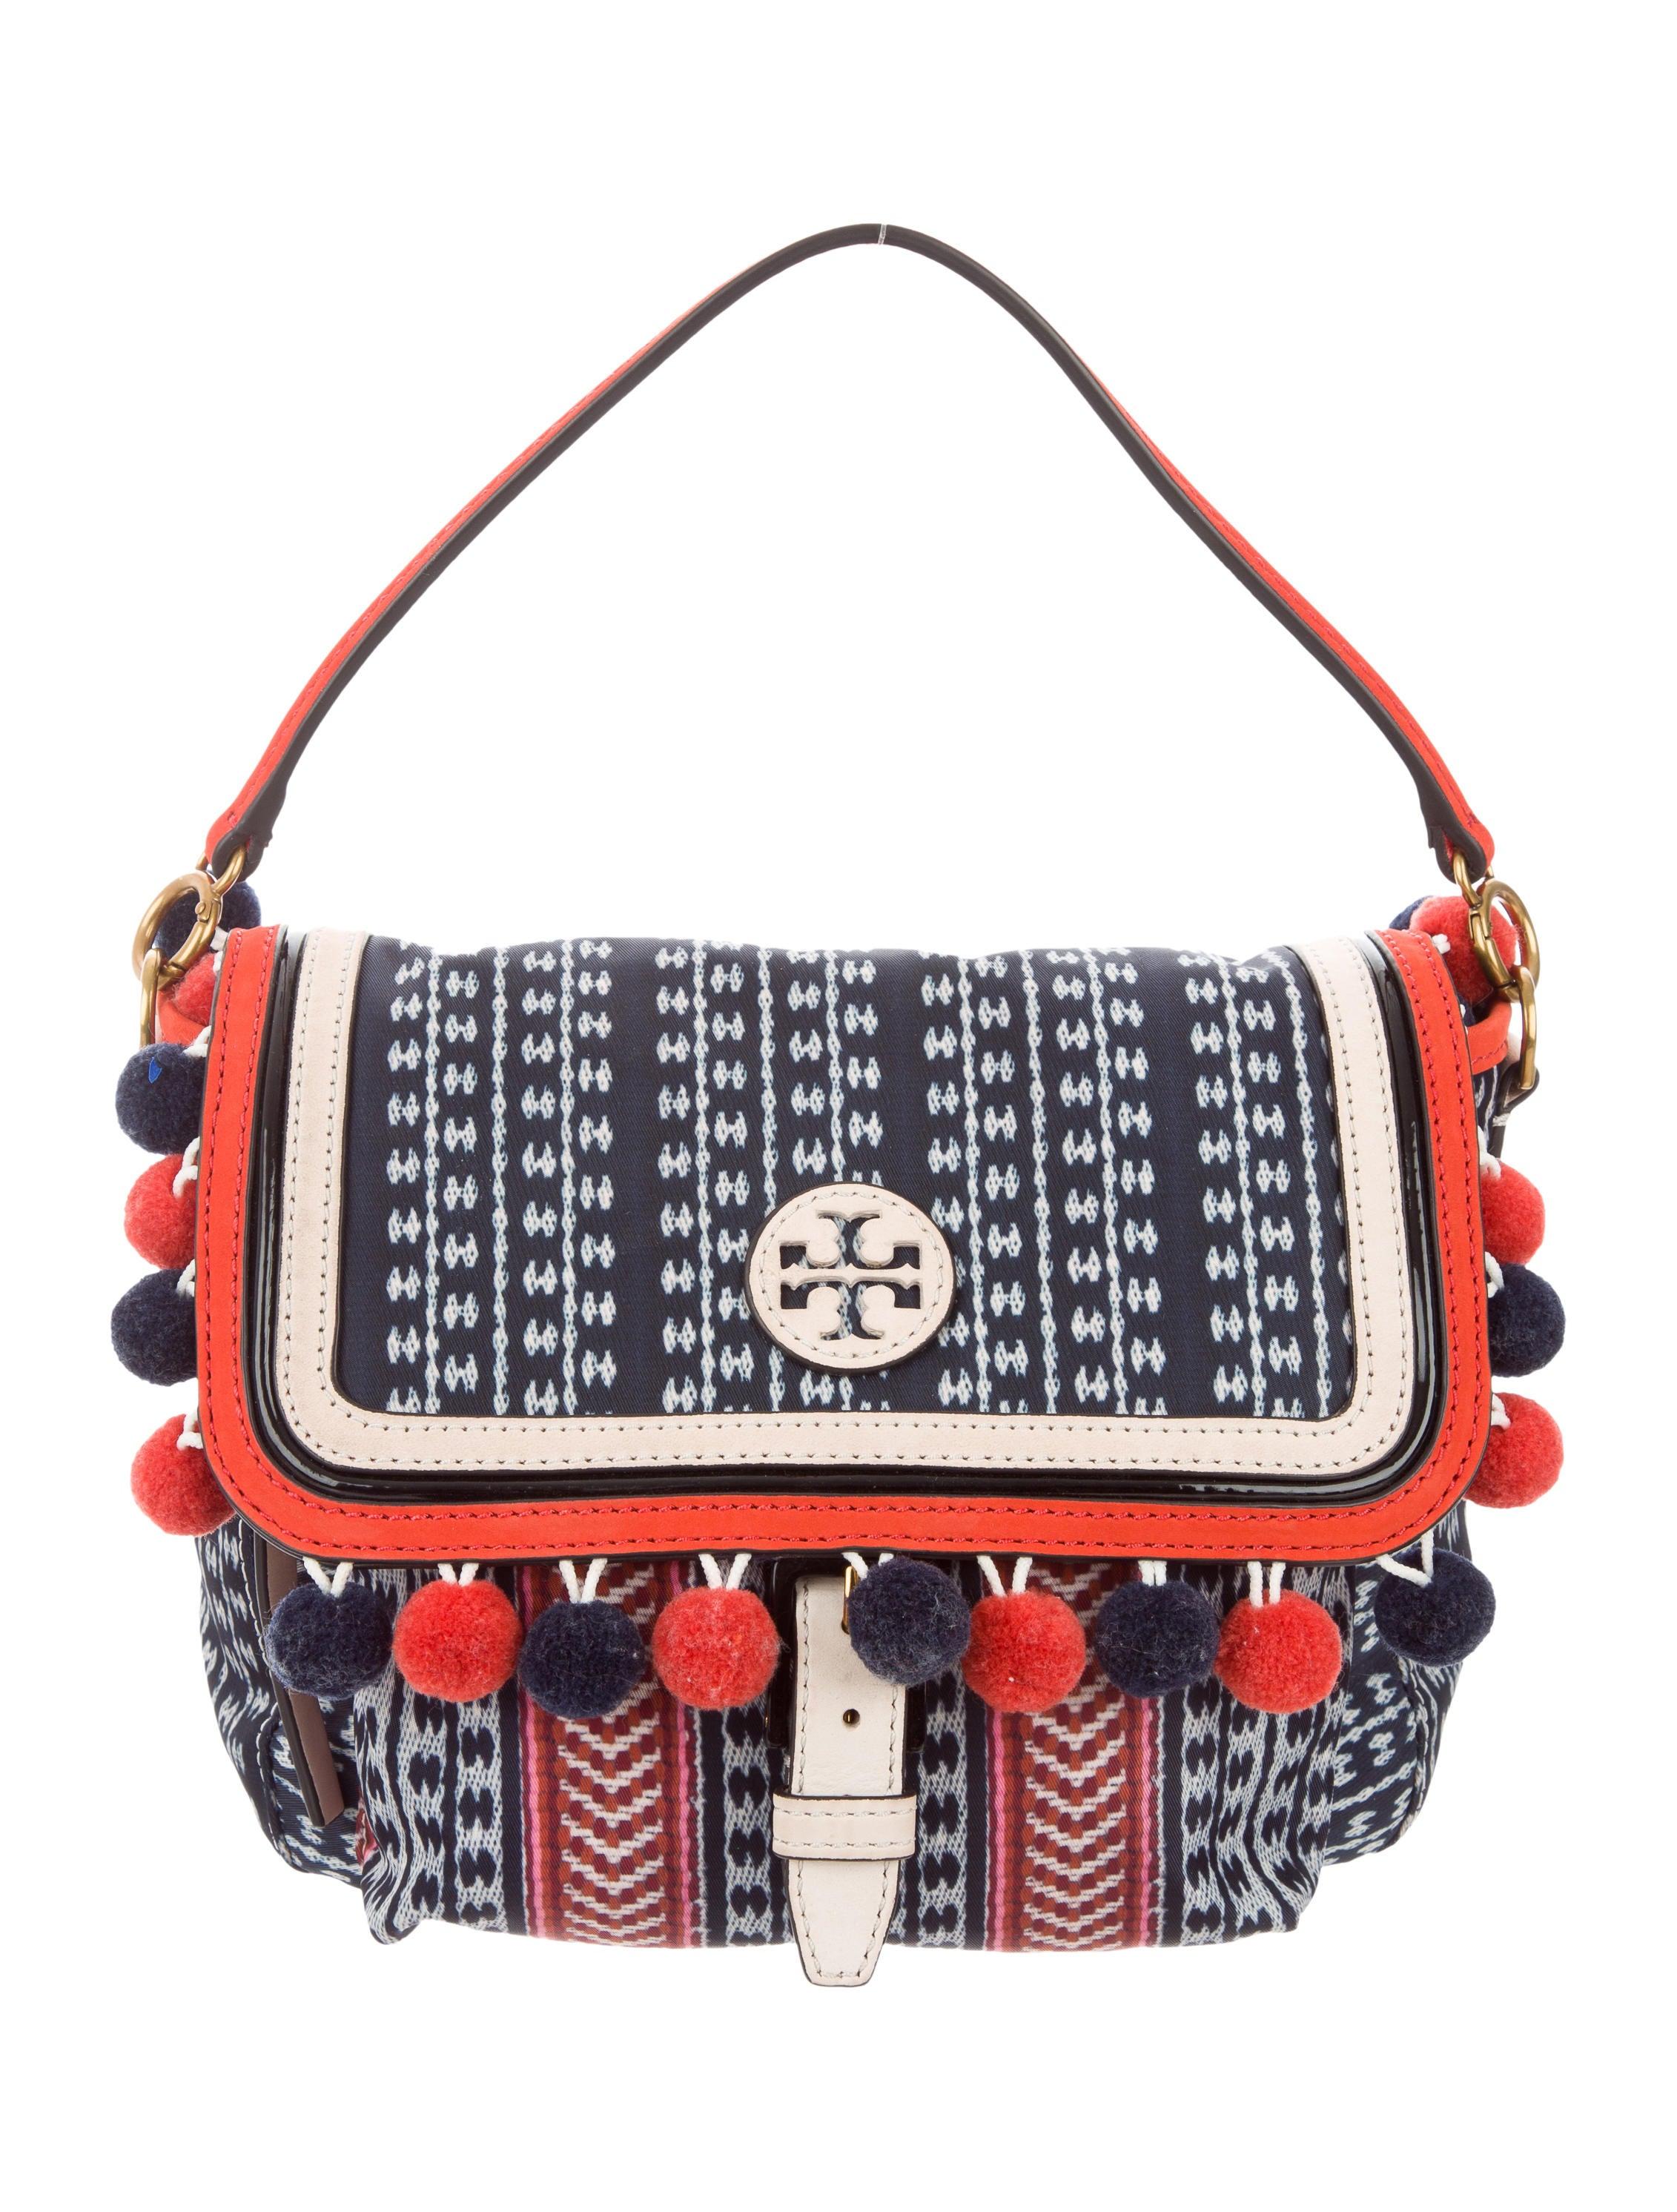 647a094bcb29 Tory Burch Scout Pom-Pom Crossbody Bag - Handbags - WTO113442